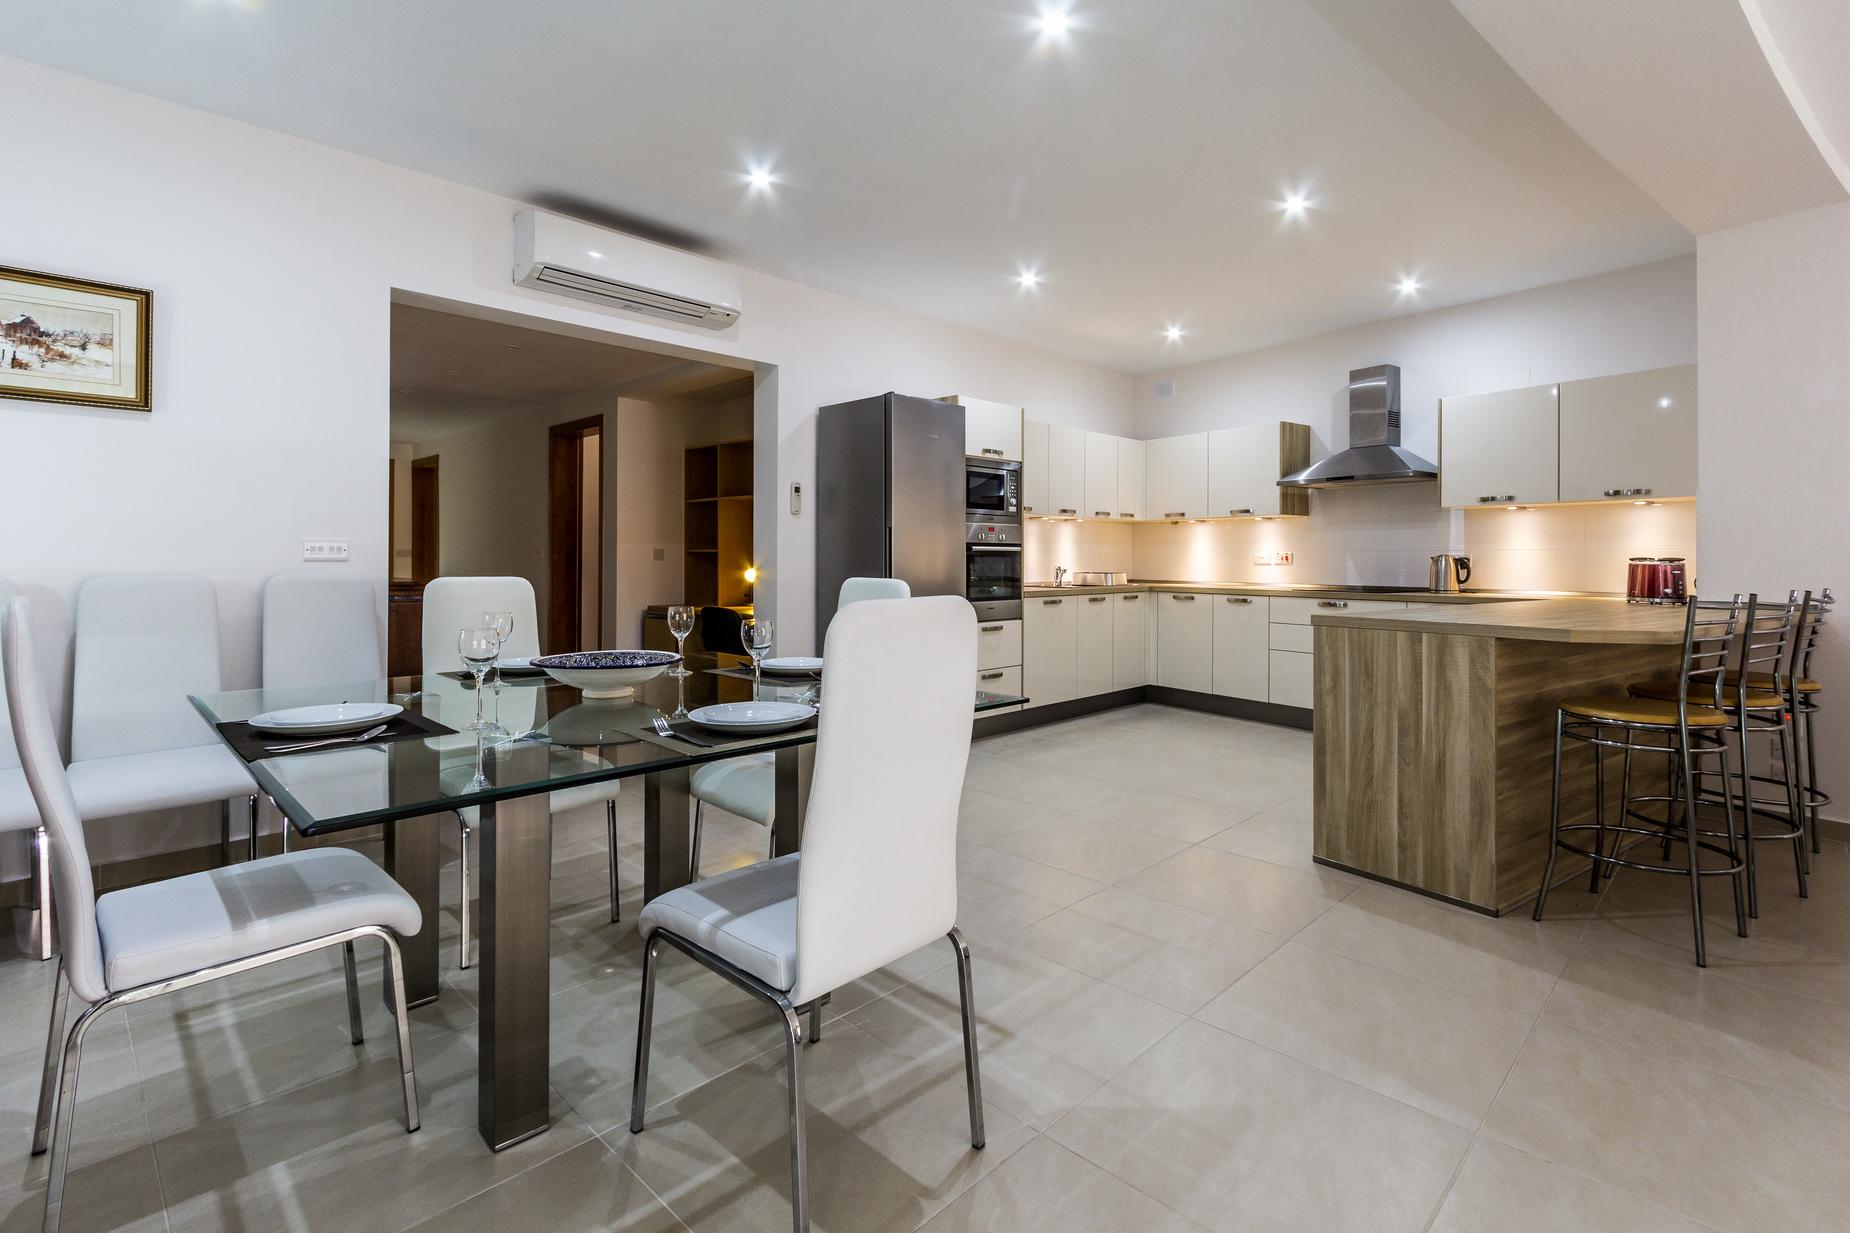 2 bed Apartment For Rent in Marsascala, Marsascala - thumb 5